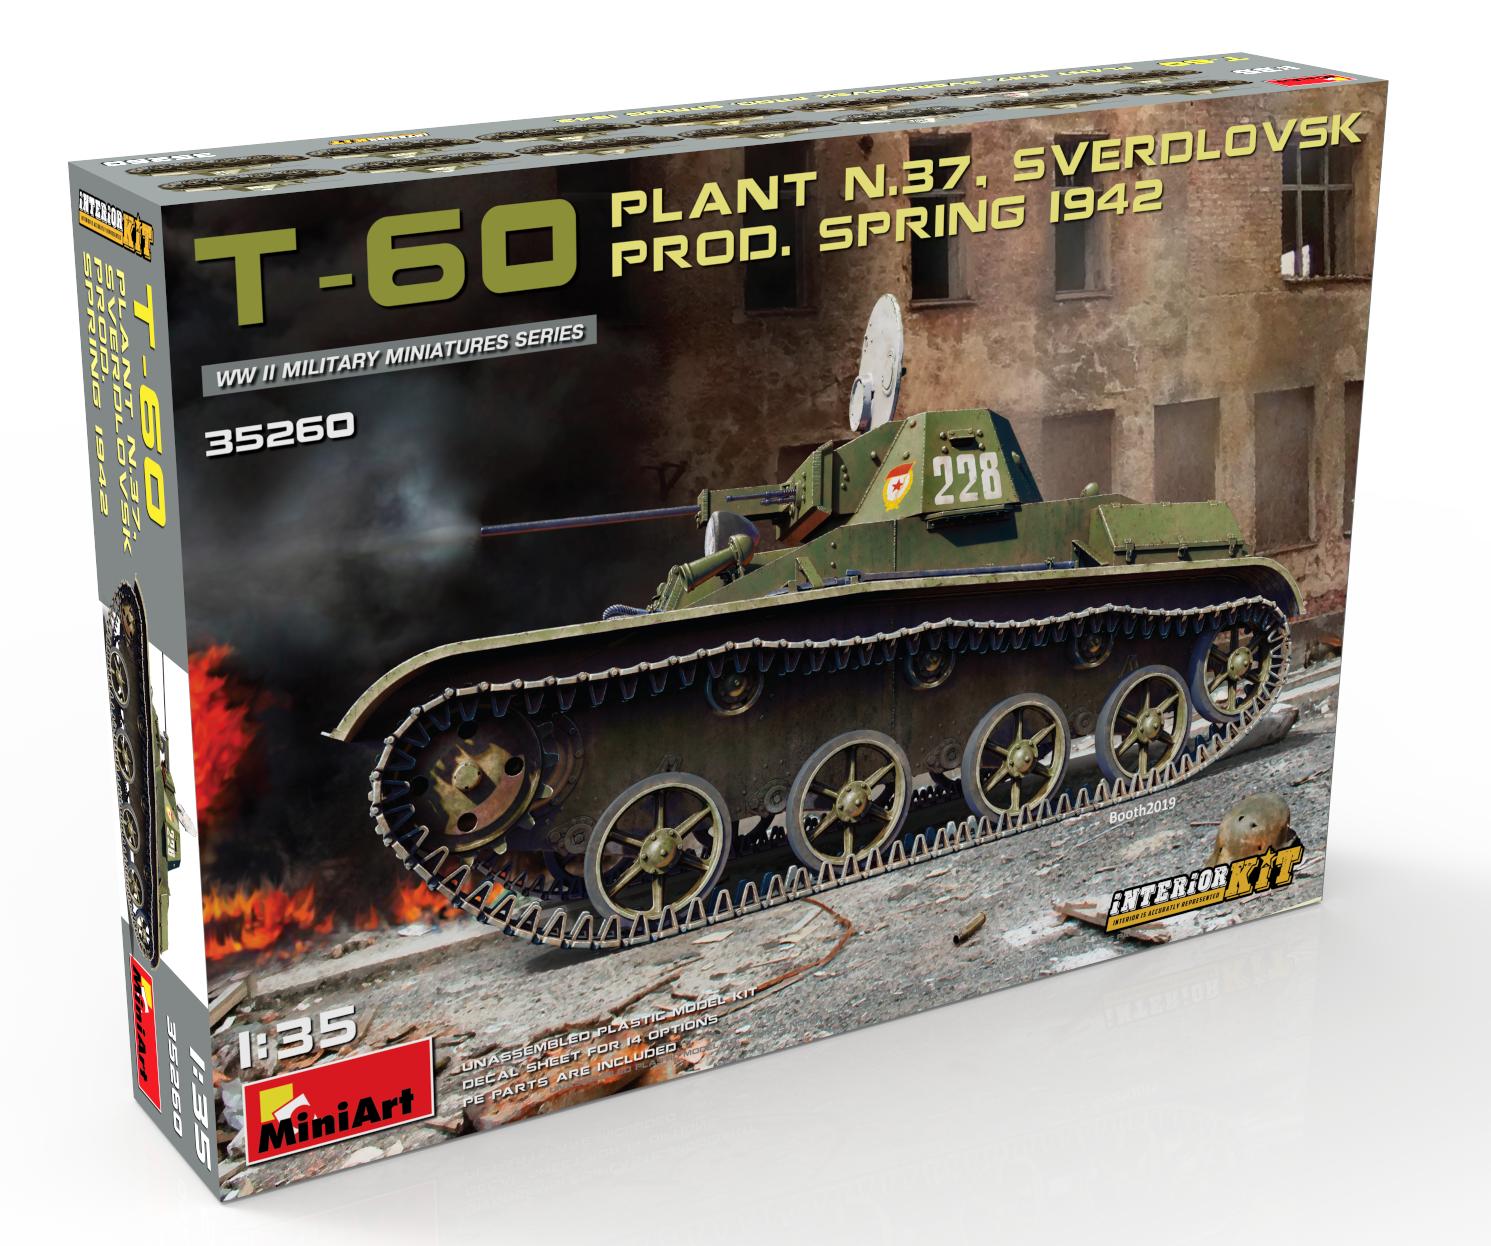 New Photos of Kit: 35260 T-60 PLANT N.37, SVERDLOVSK PROD. SPRING 1942. INTERIOR KIT